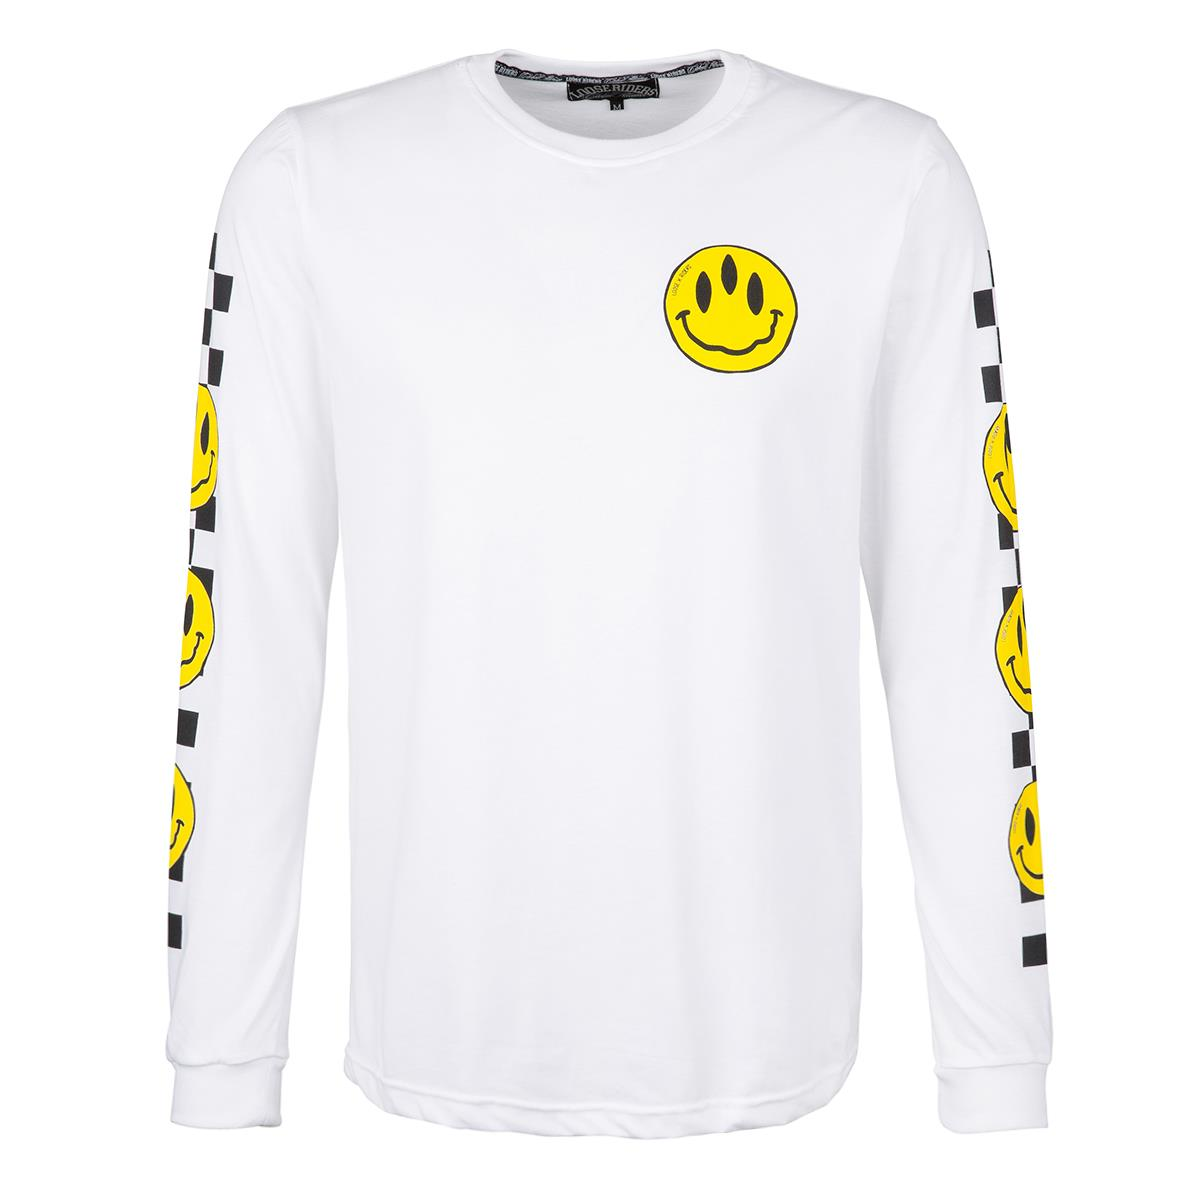 Loose Riders Sweatshirt  Stoked! - Weiß/Schwarz/Gelb